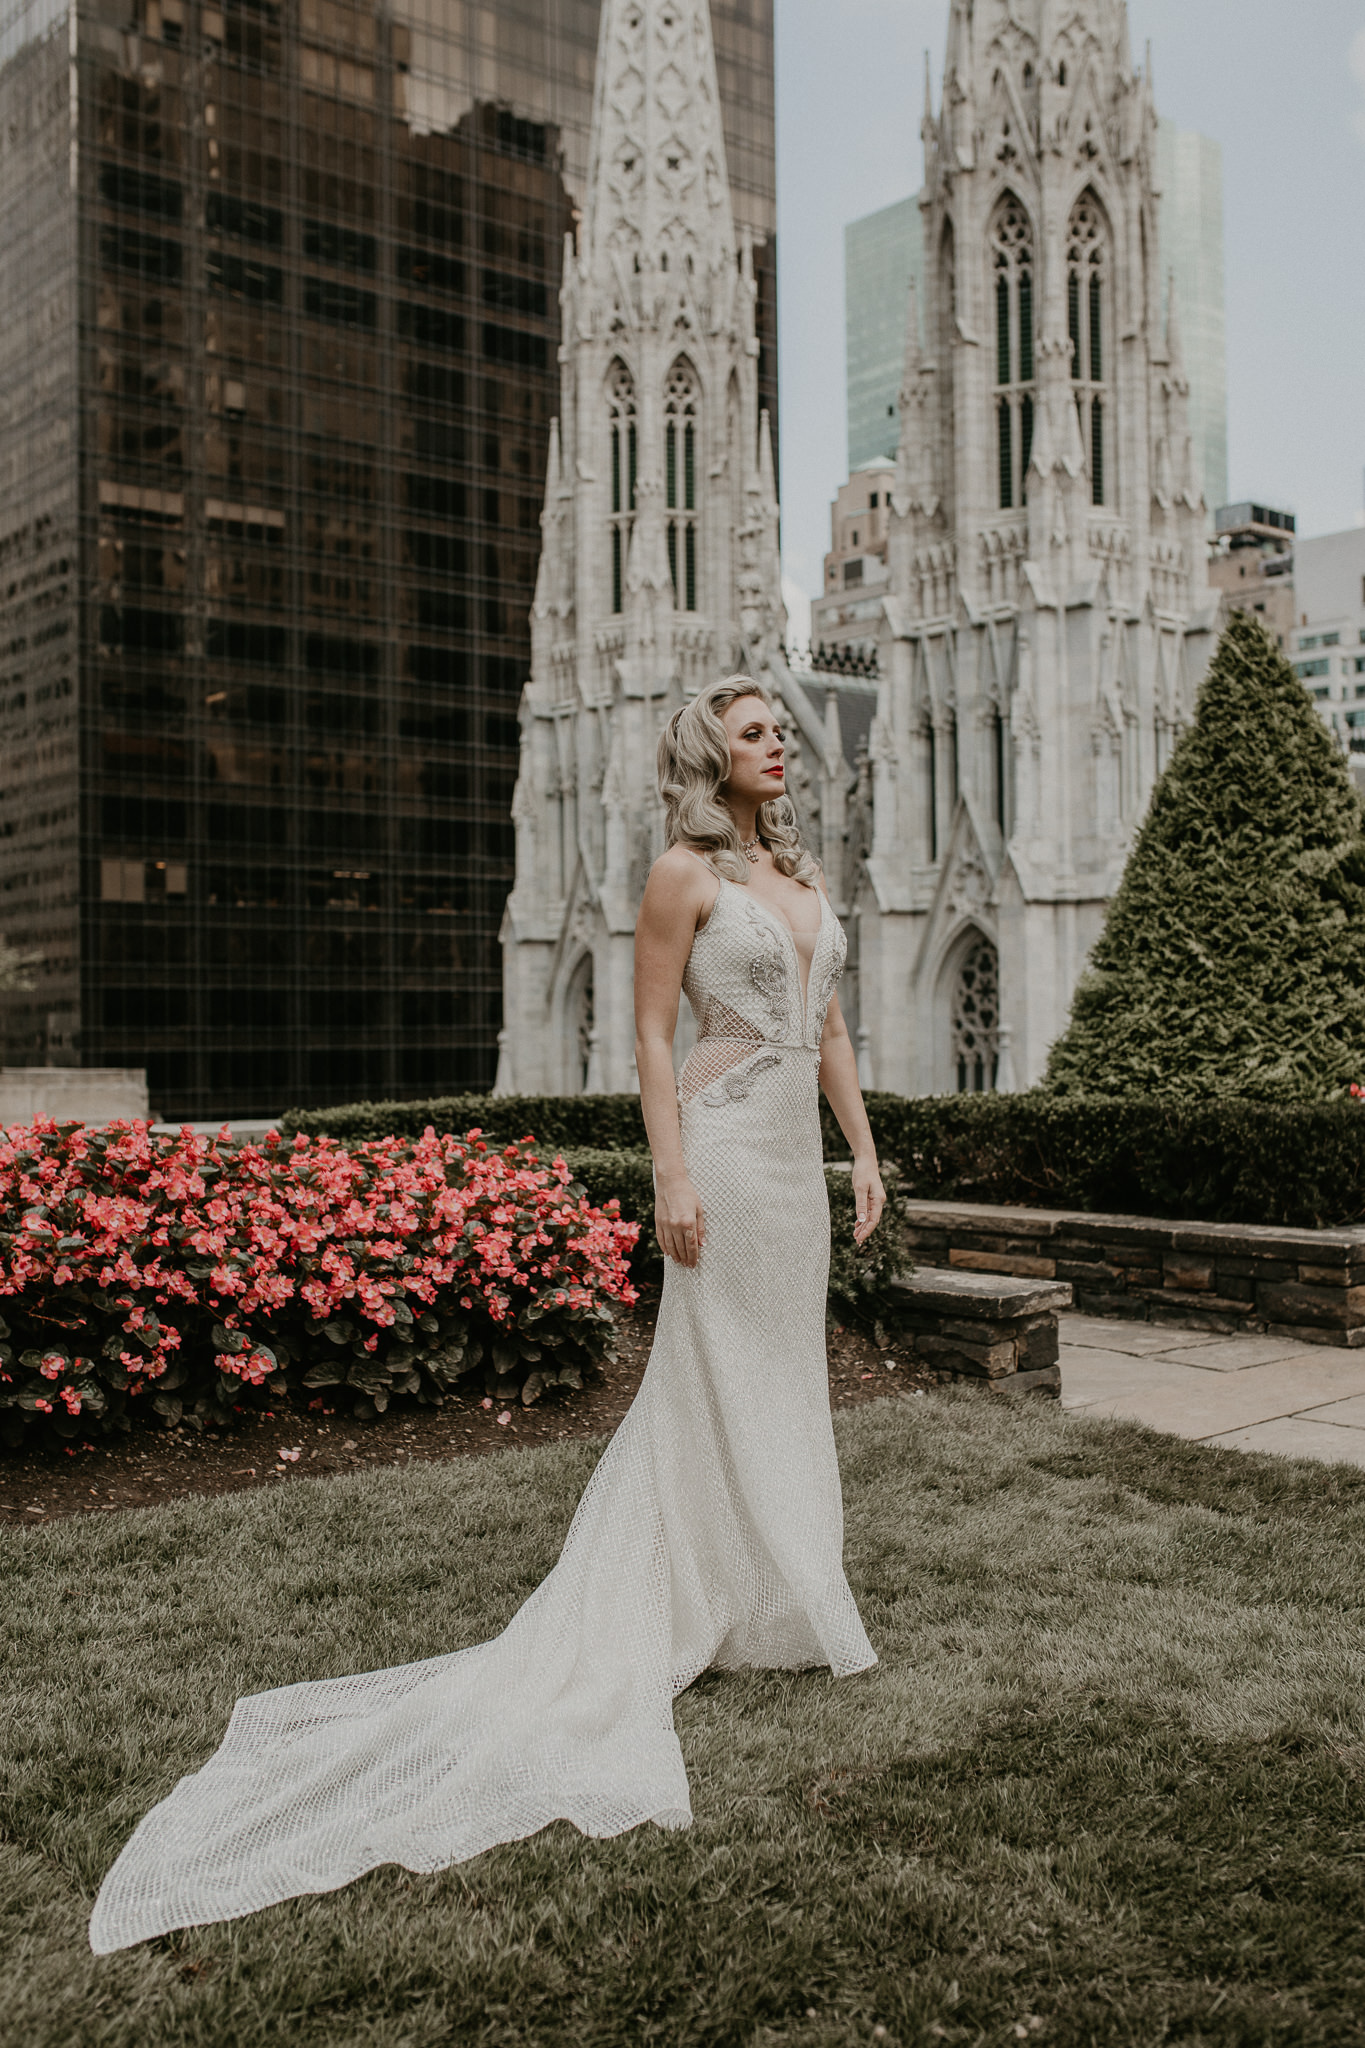 M+J_NYC_Wedding_StPatricks_30Rock_RainbowRoom_046.jpg